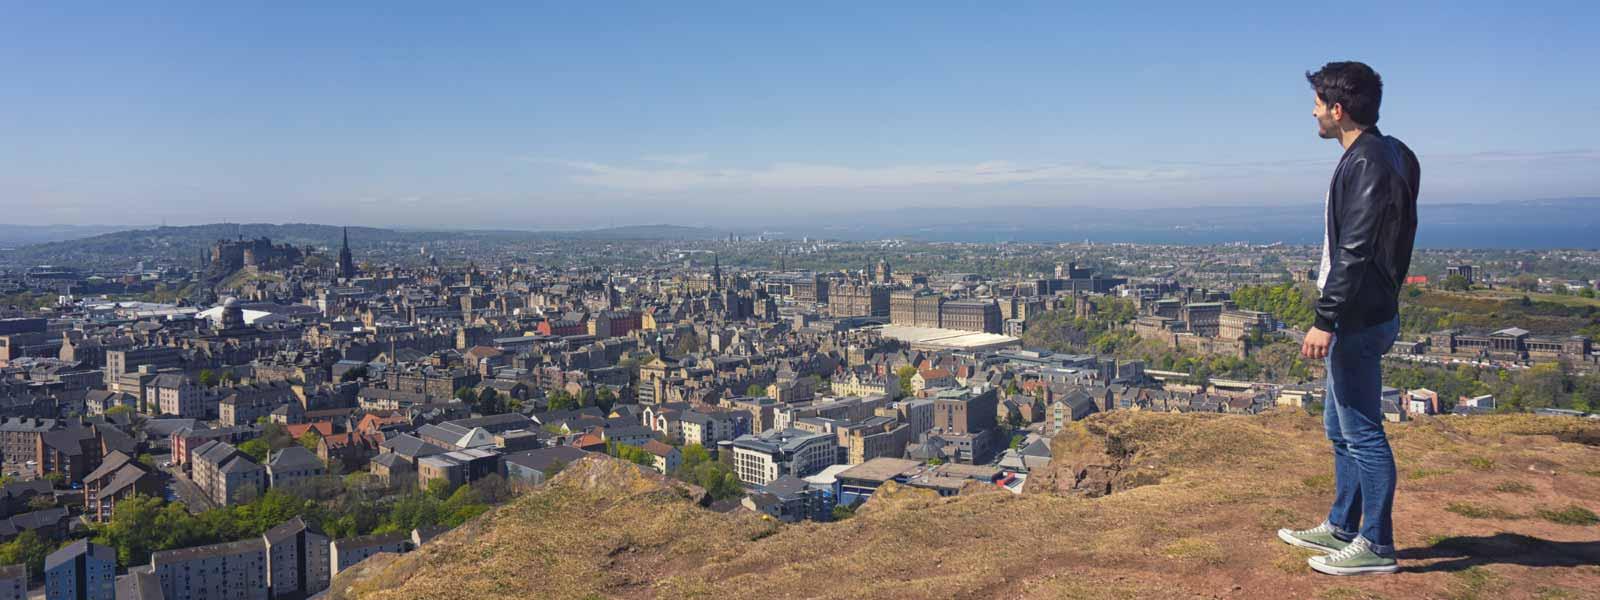 View of Edinburgh from Salisbury Crags